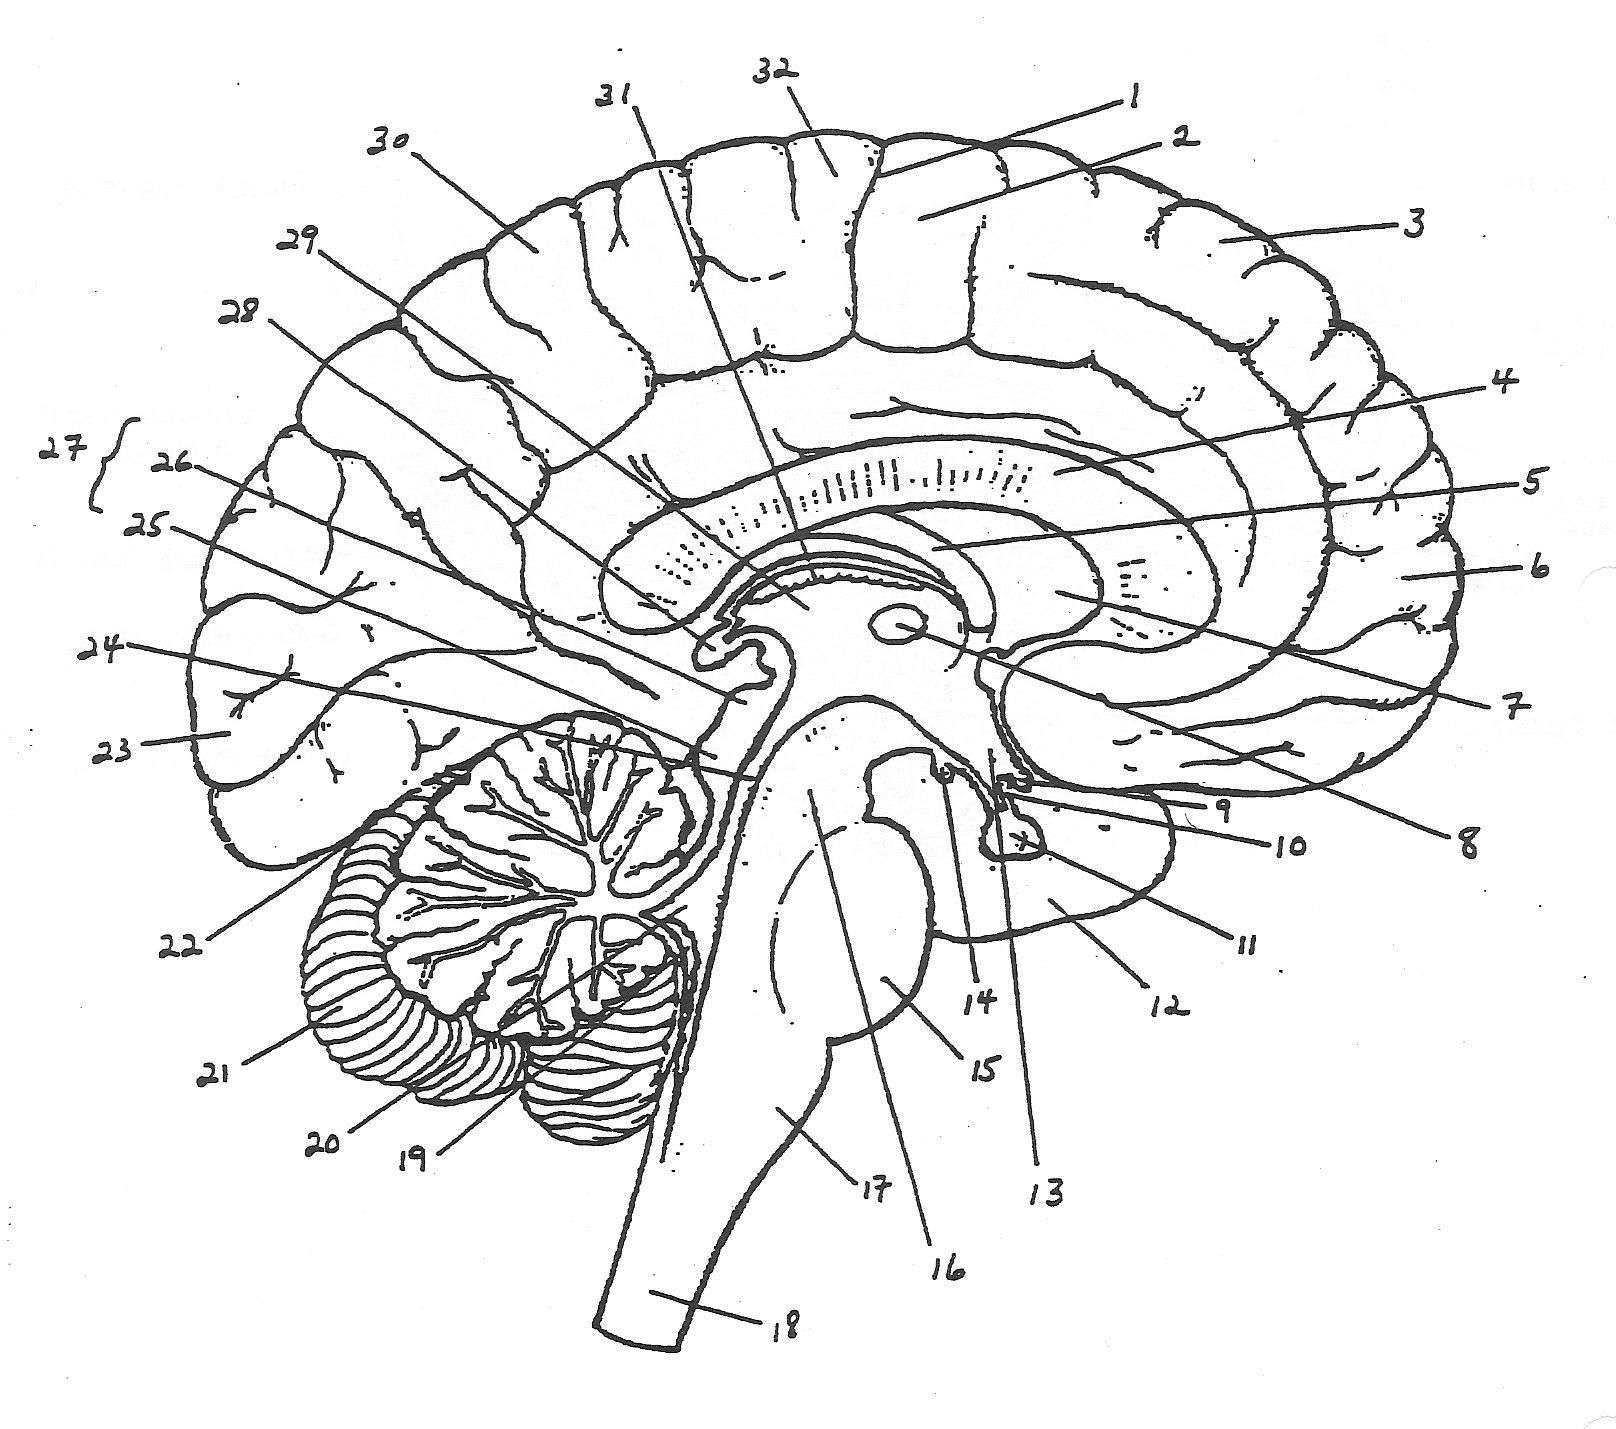 Brain Diagram Best Workout For Women Fitness Motivation Pictures [ 1429 x 1616 Pixel ]